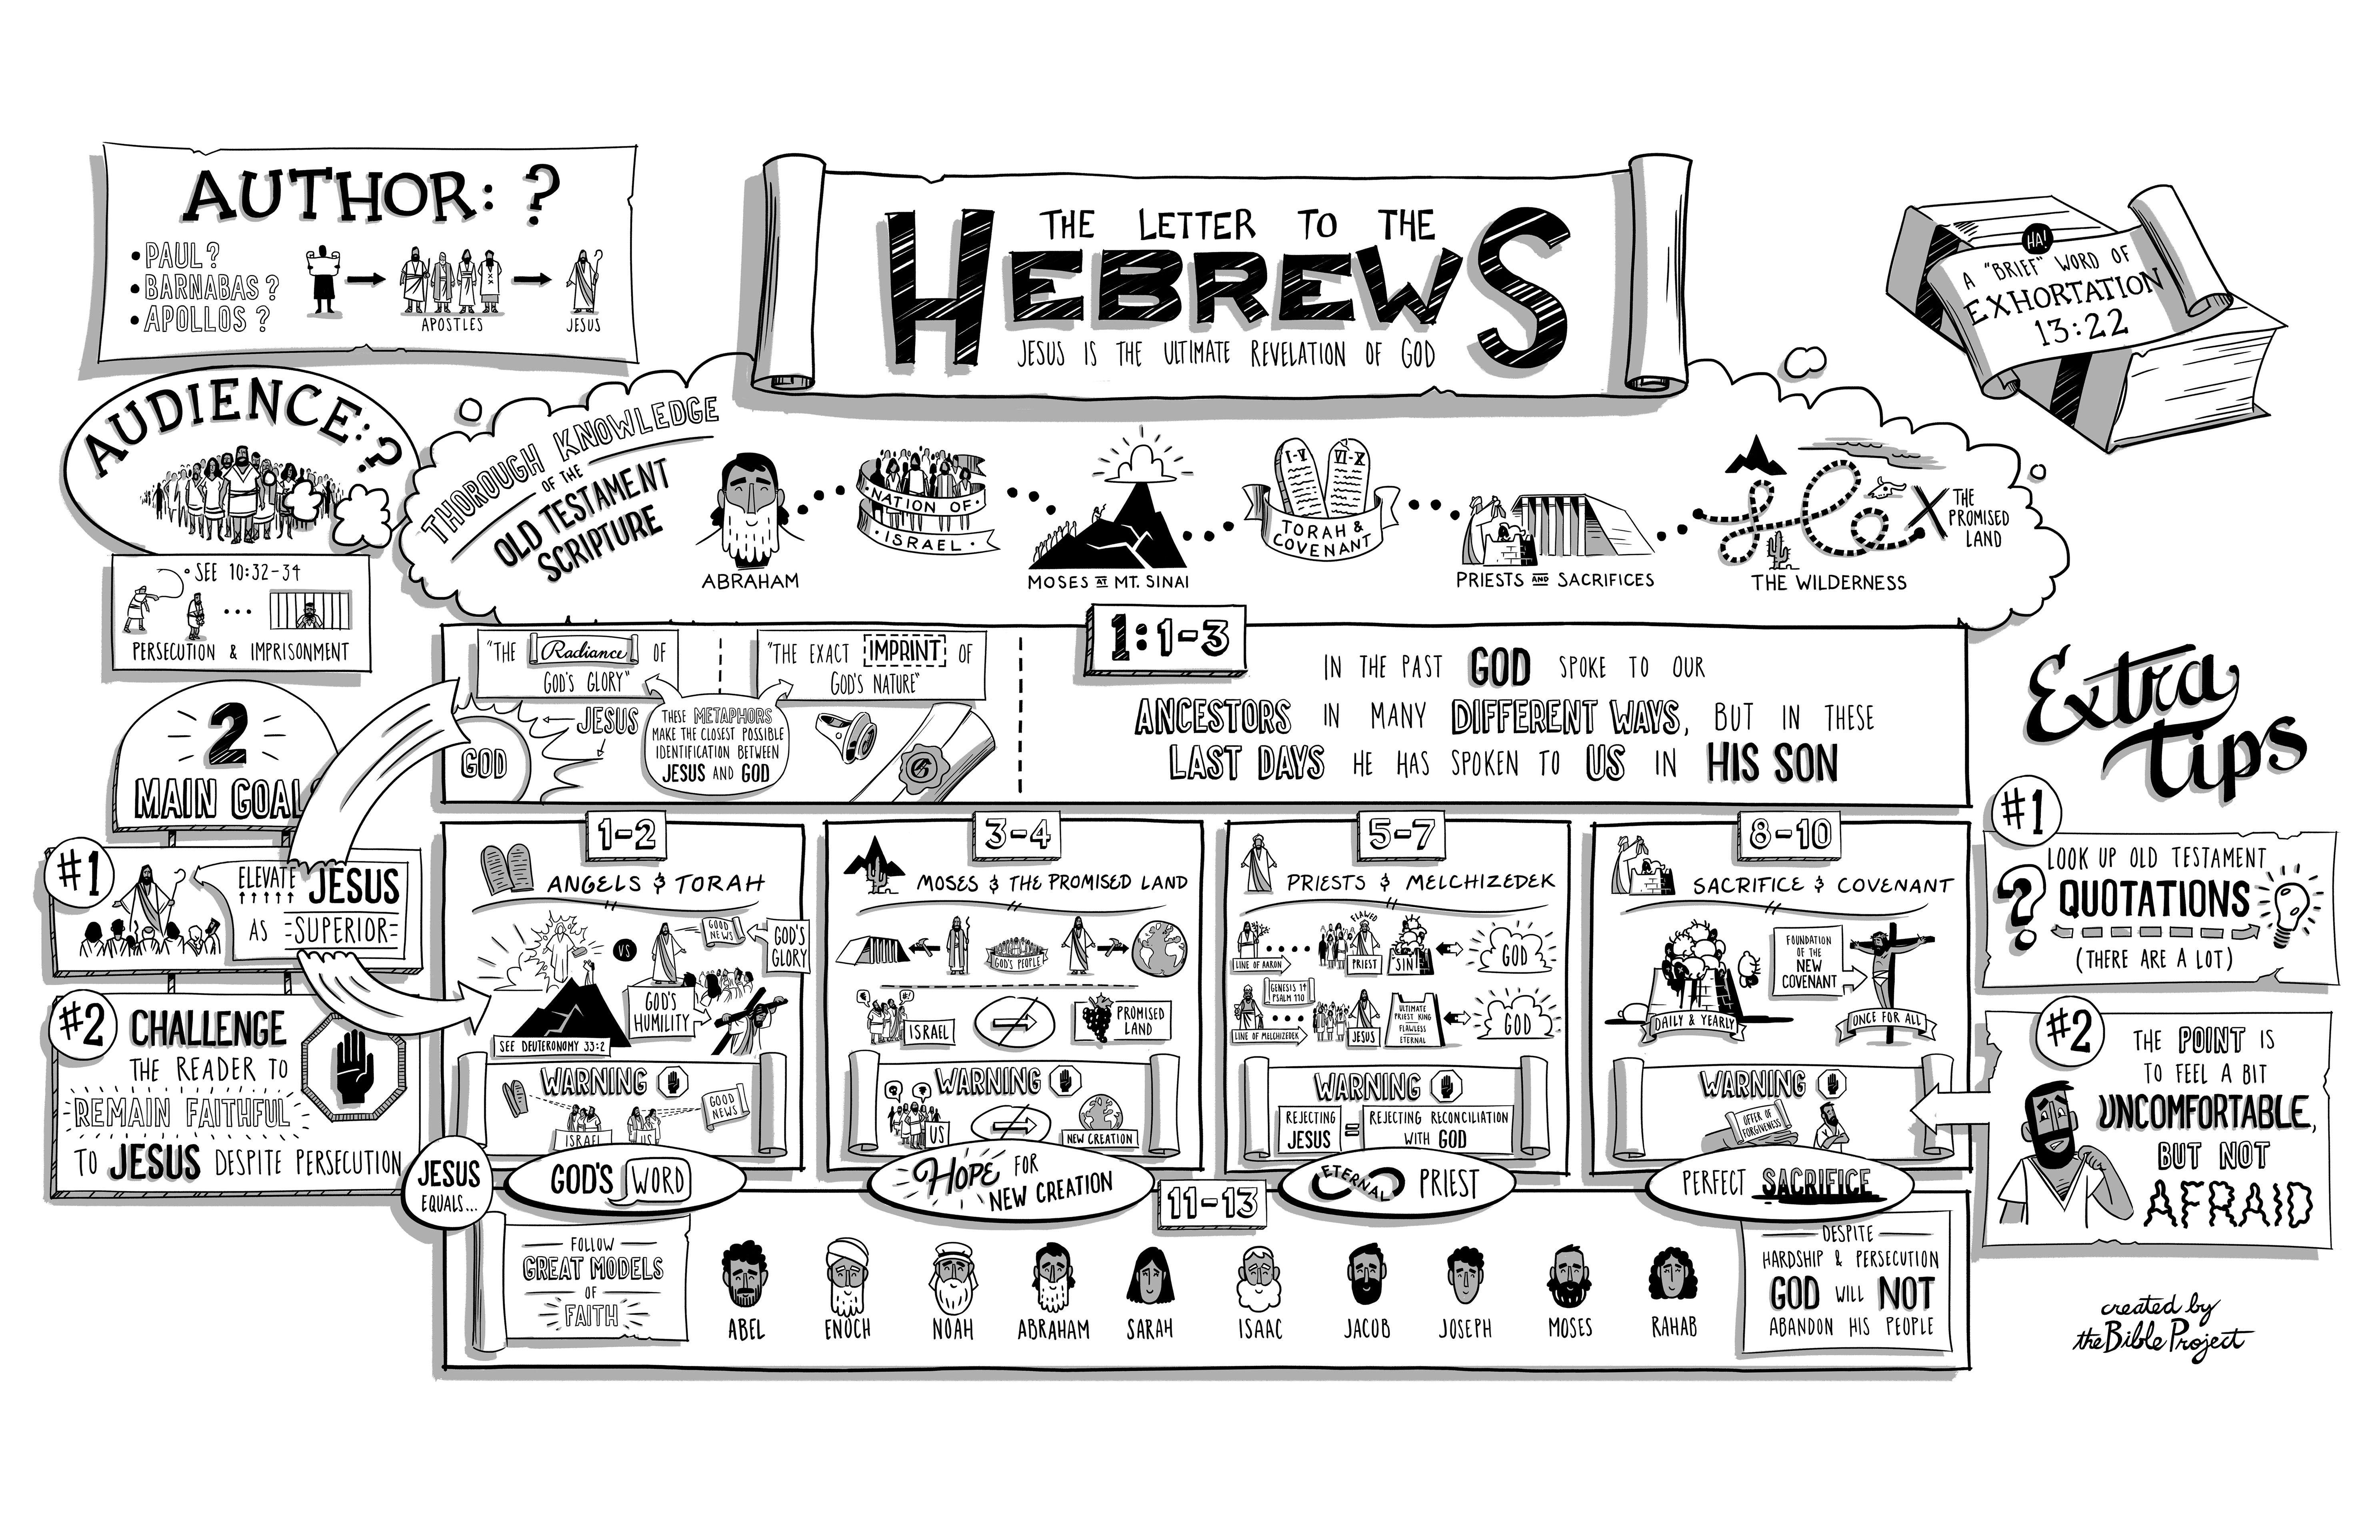 book of leviticus explained